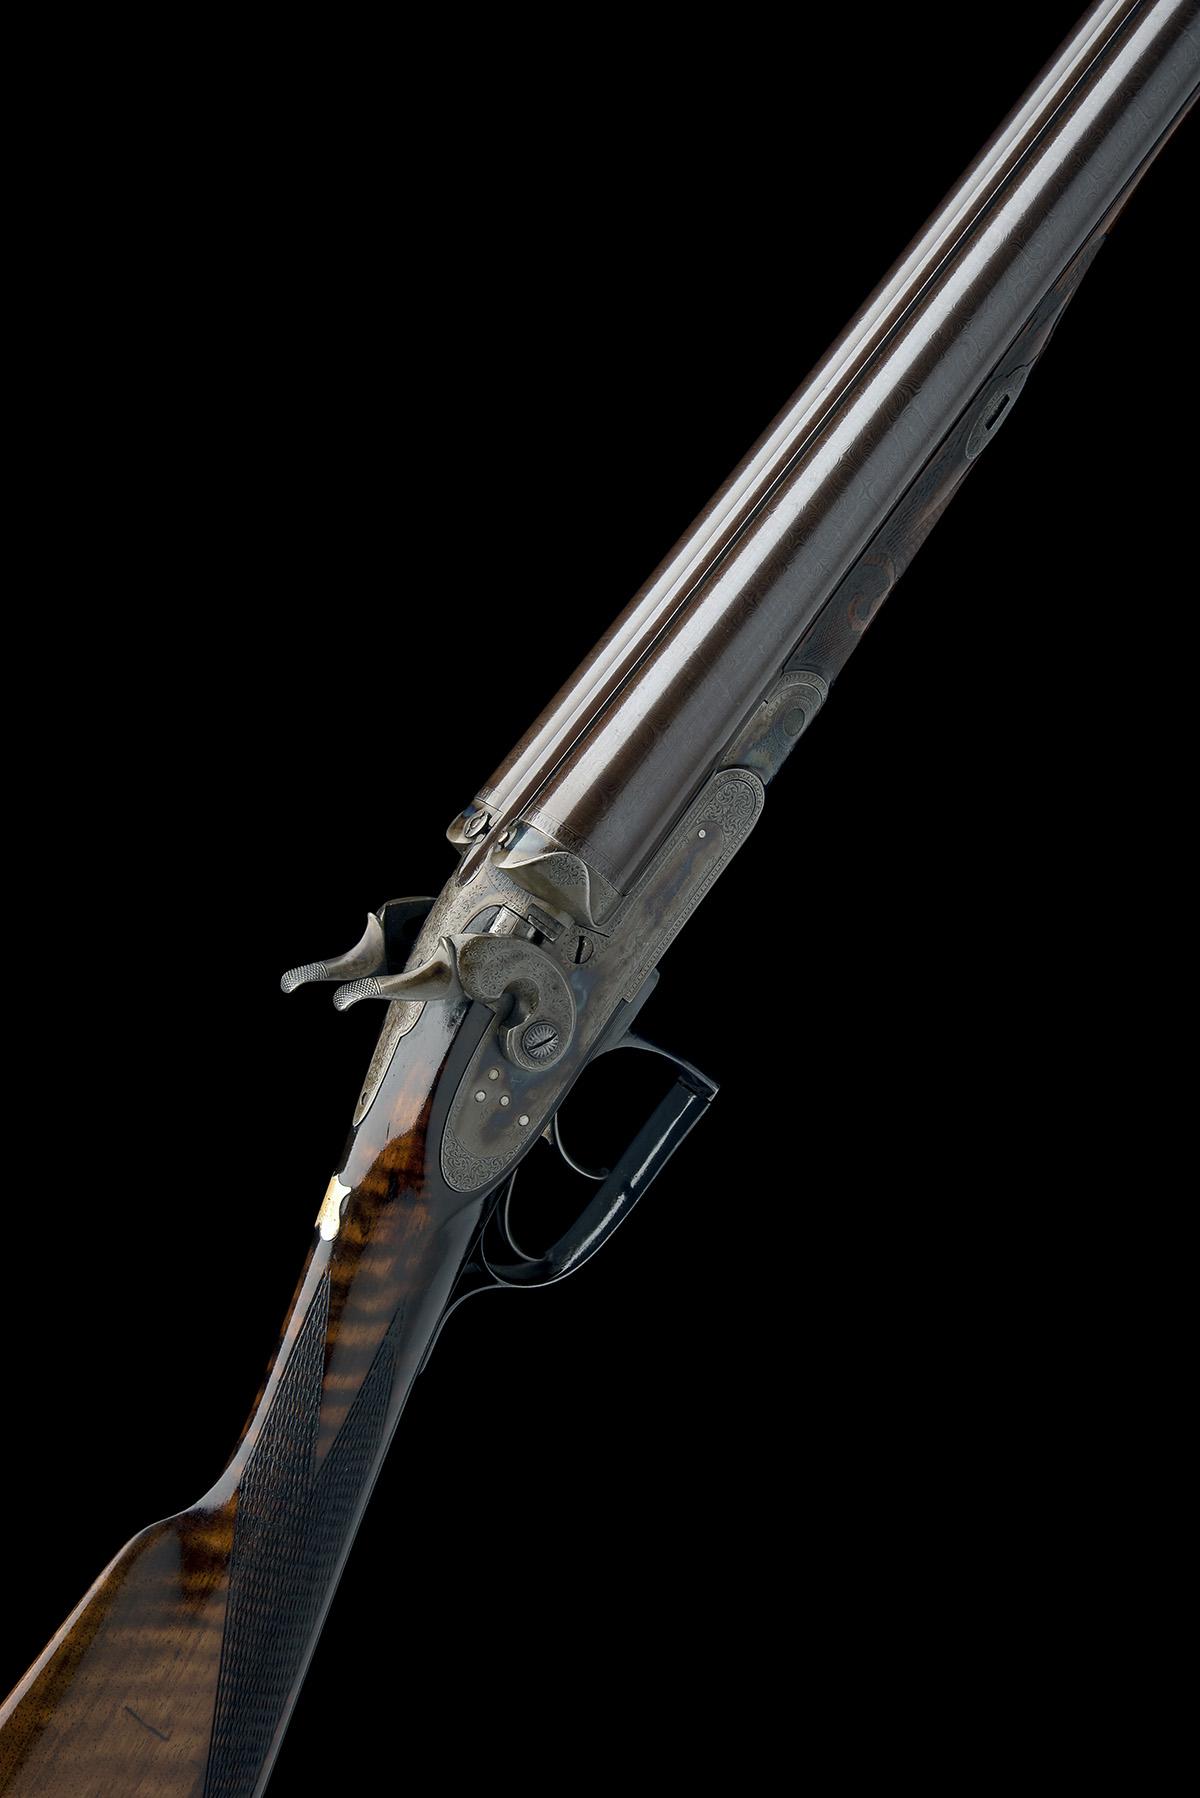 JOHN HANSON A SCARCE 12-BORE 1868 PATENT SLIDING GUARD HAMMERGUN, serial no. 731, circa 1870,